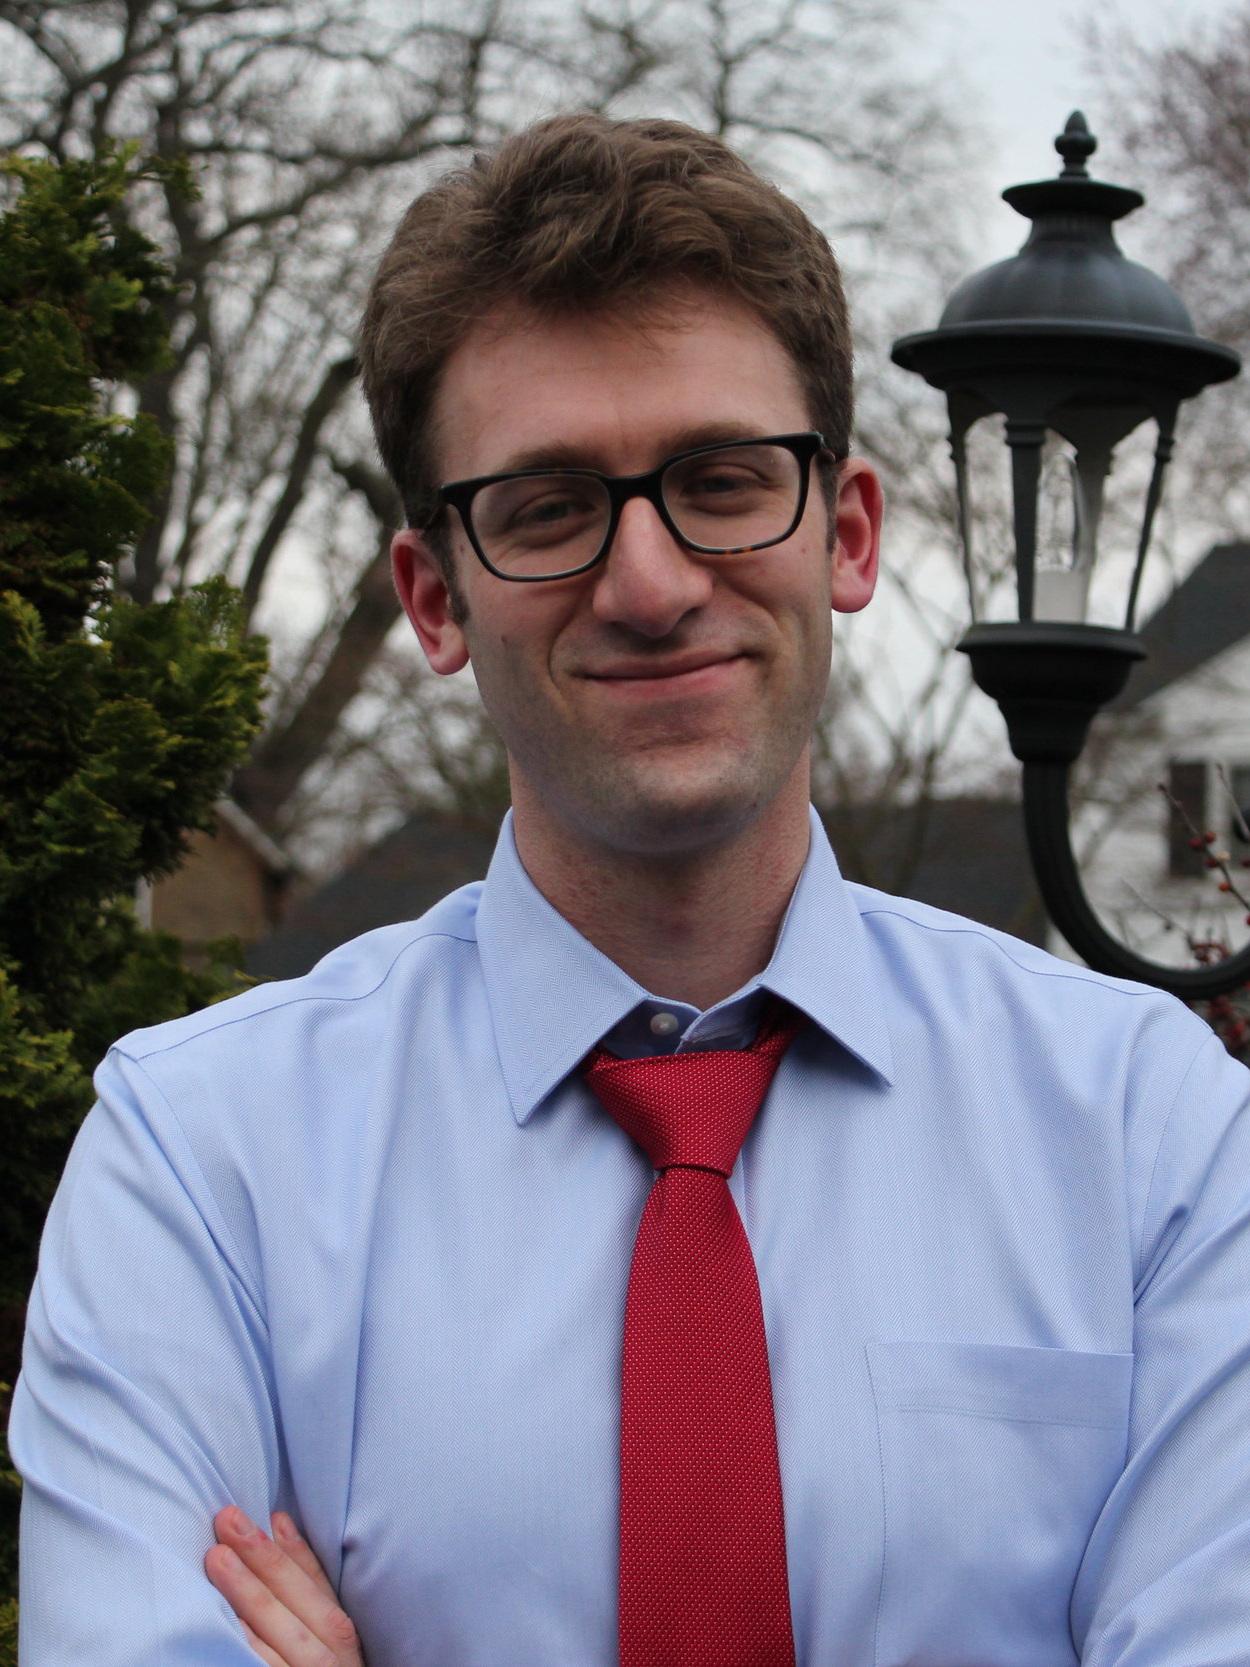 Max Cooper - Ward 1 Commissioner